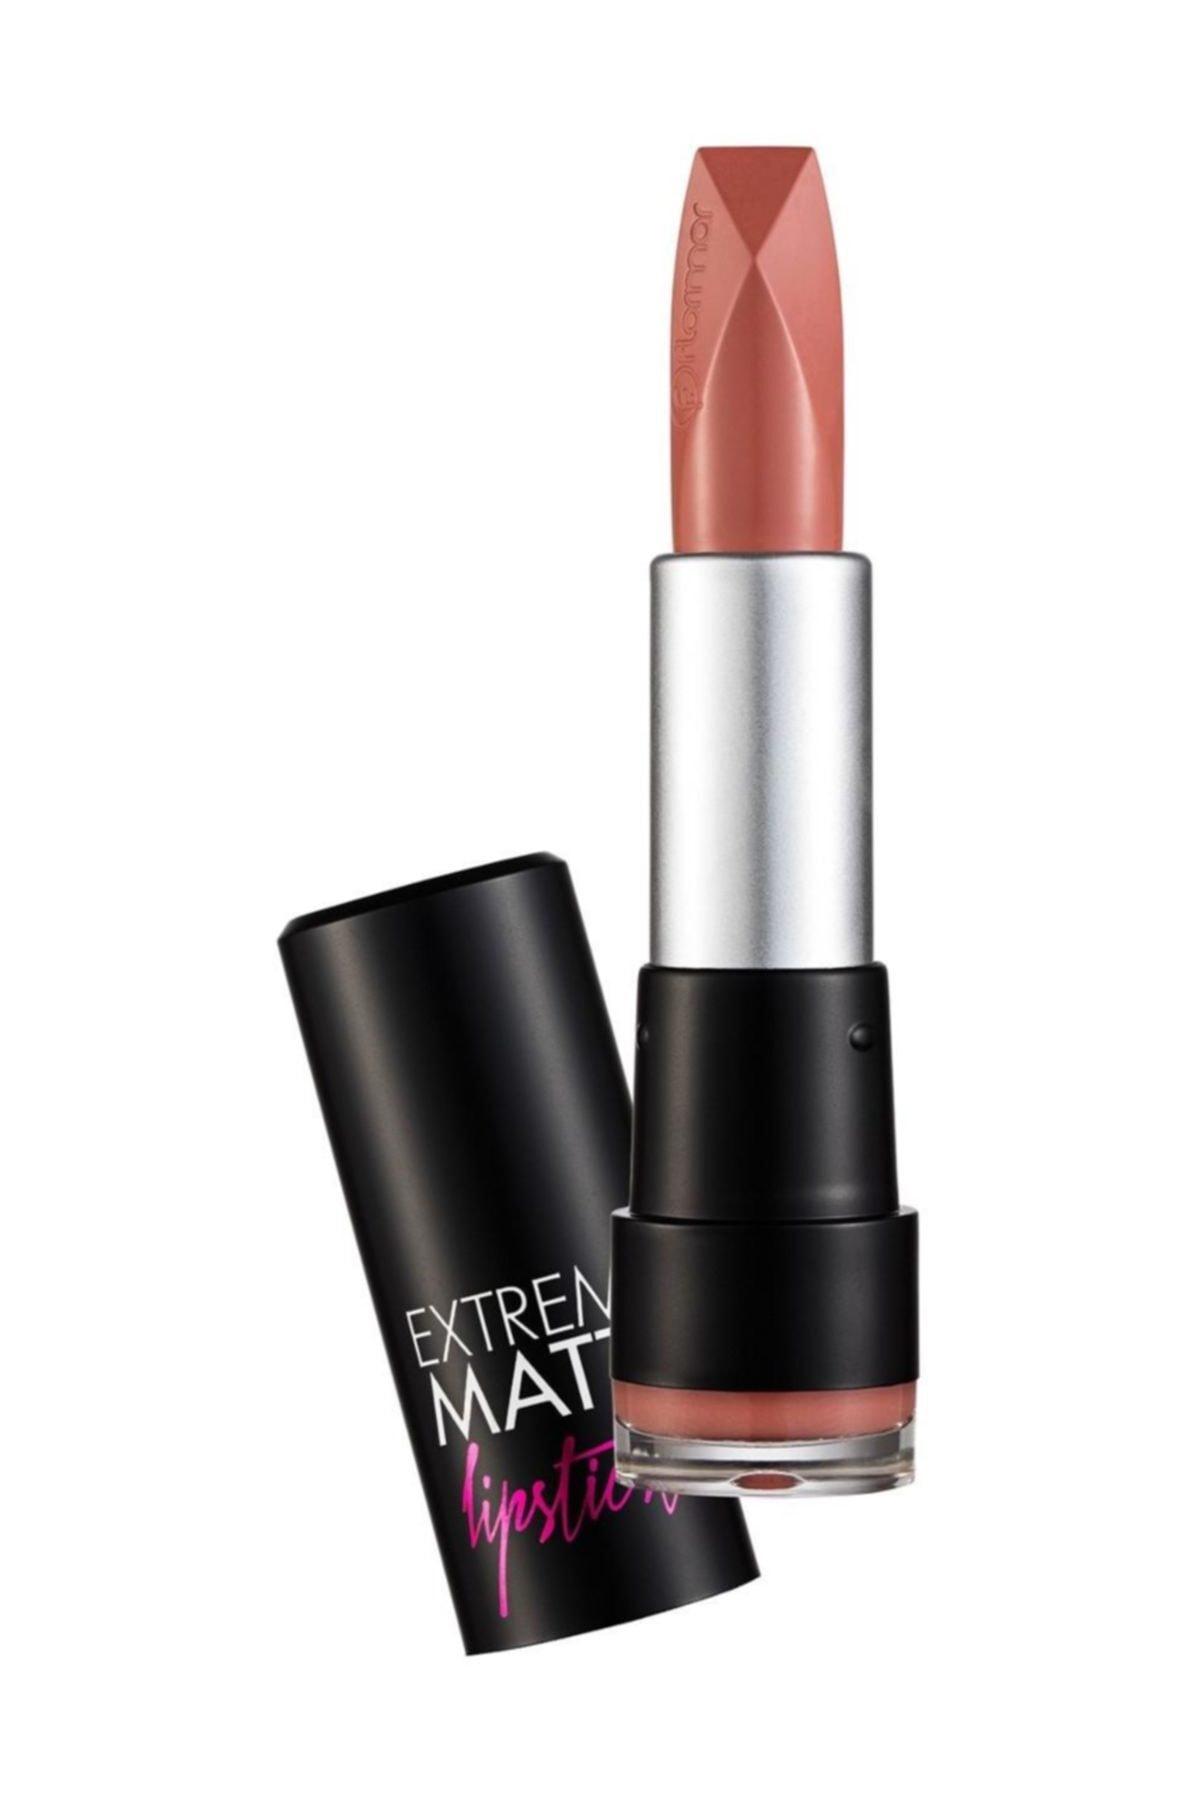 Ruj - Extreme Matte Lipstick Skin Tone 8690604394975